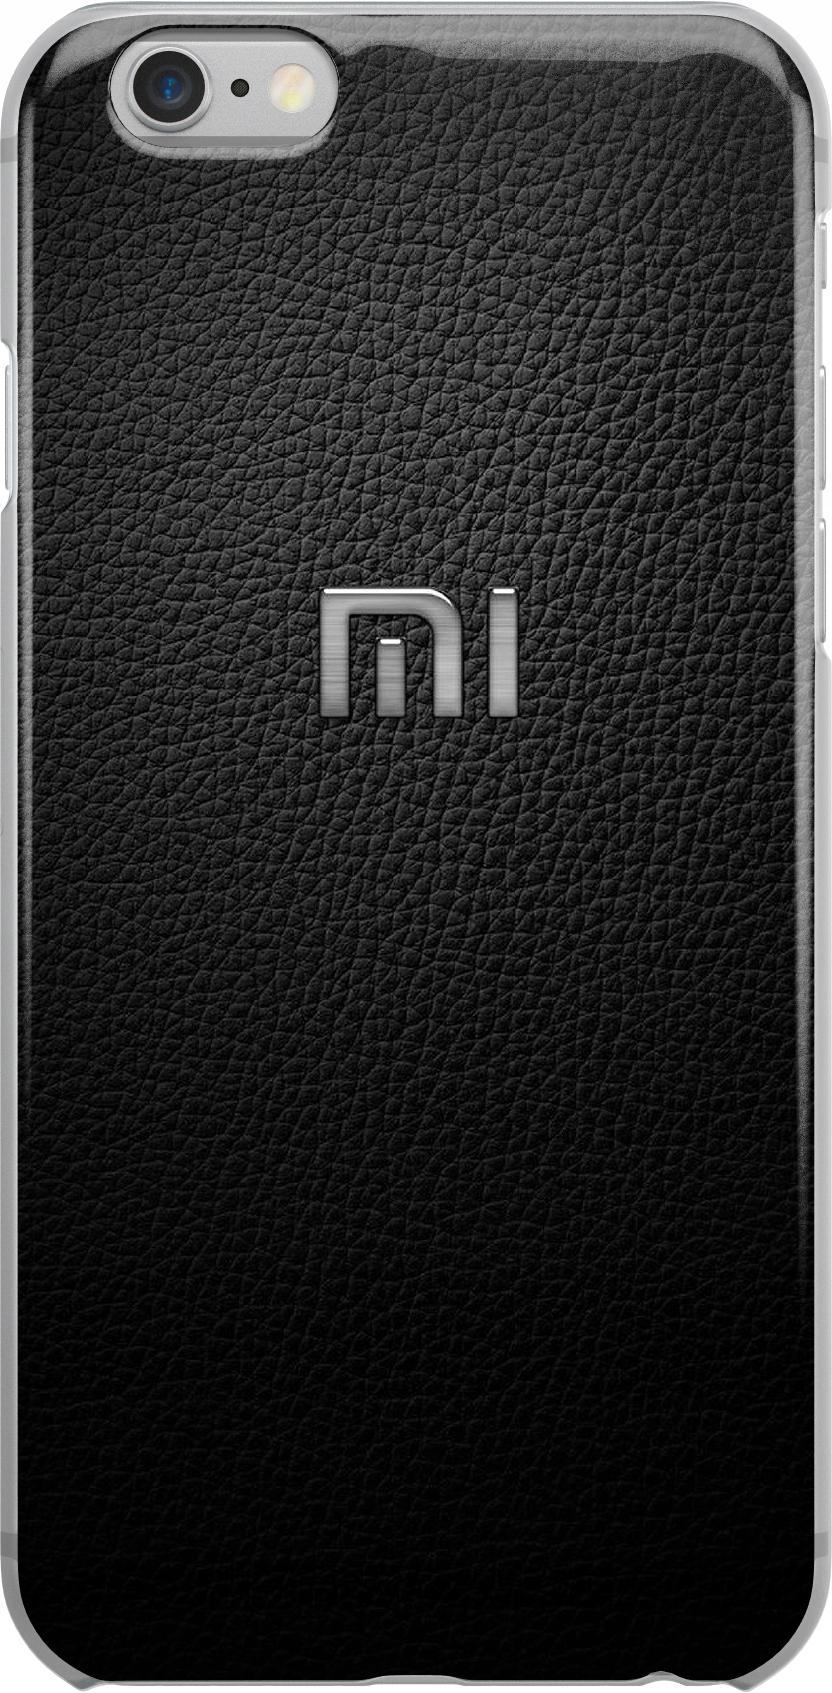 Etui Wzory Xiaomi Nokia 9